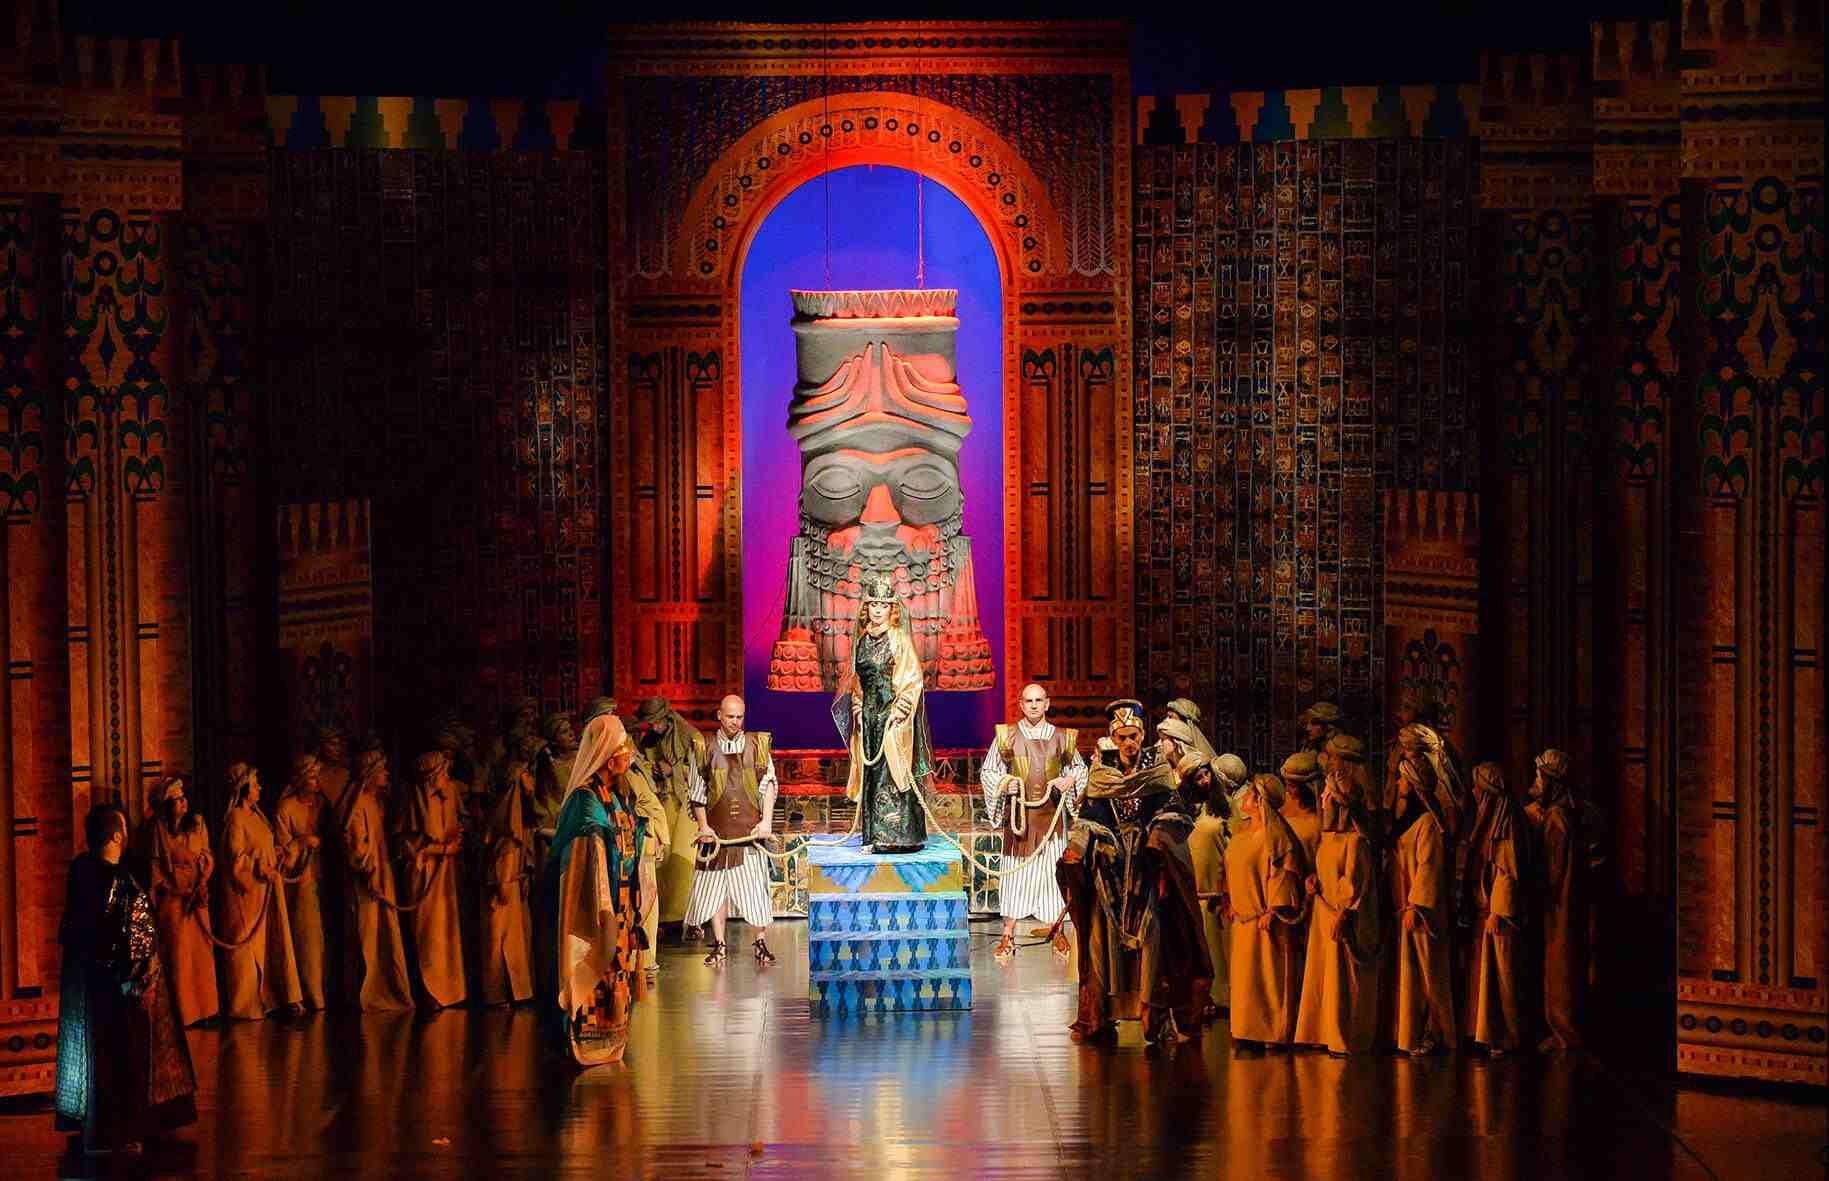 Opera Aperta revine – Piața Unirii devine locul întâlnirii clujenilor cu opera